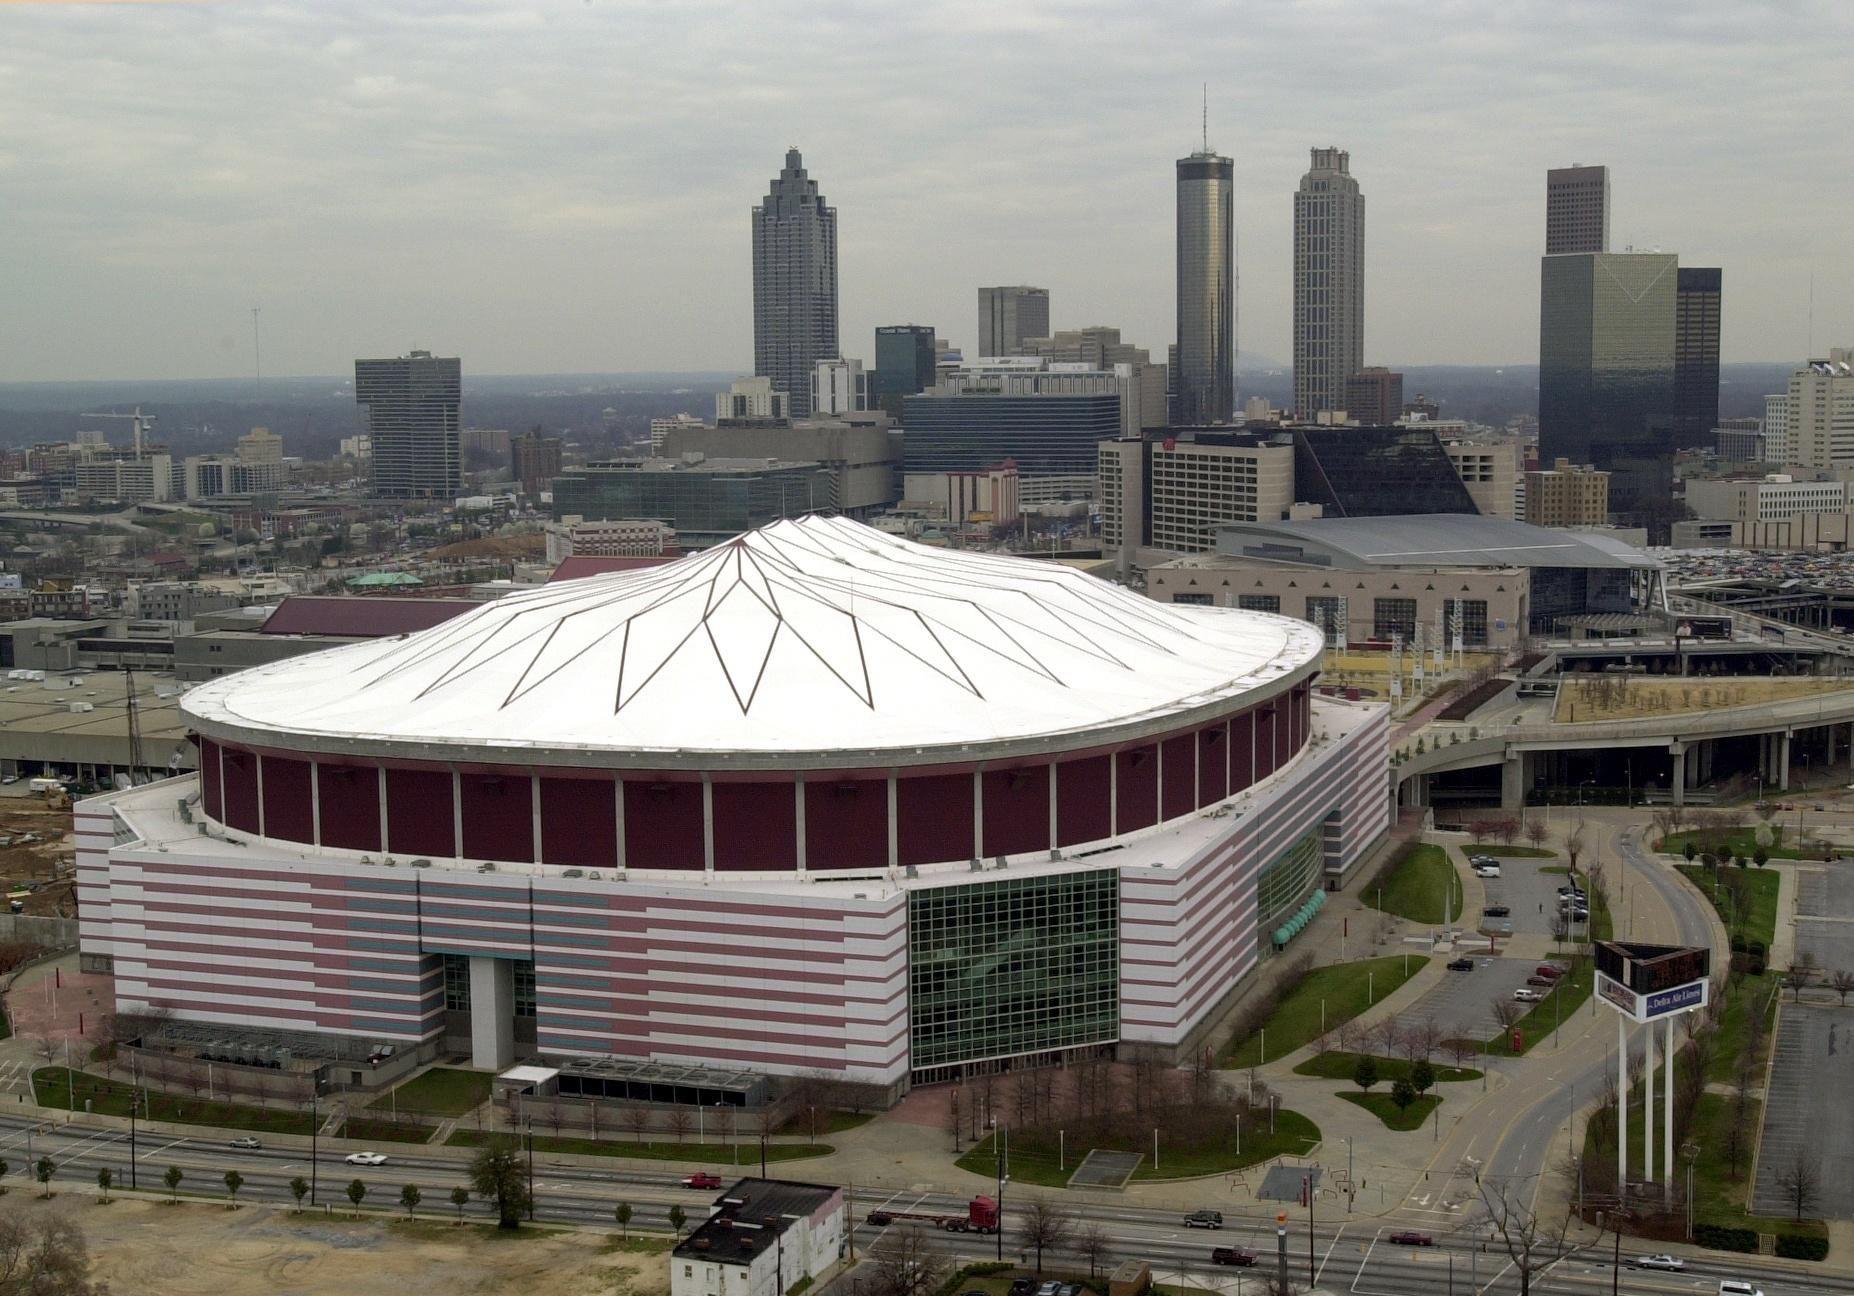 Falcons Owner Atlanta Mayor Reach Deal On Downtown Stadium